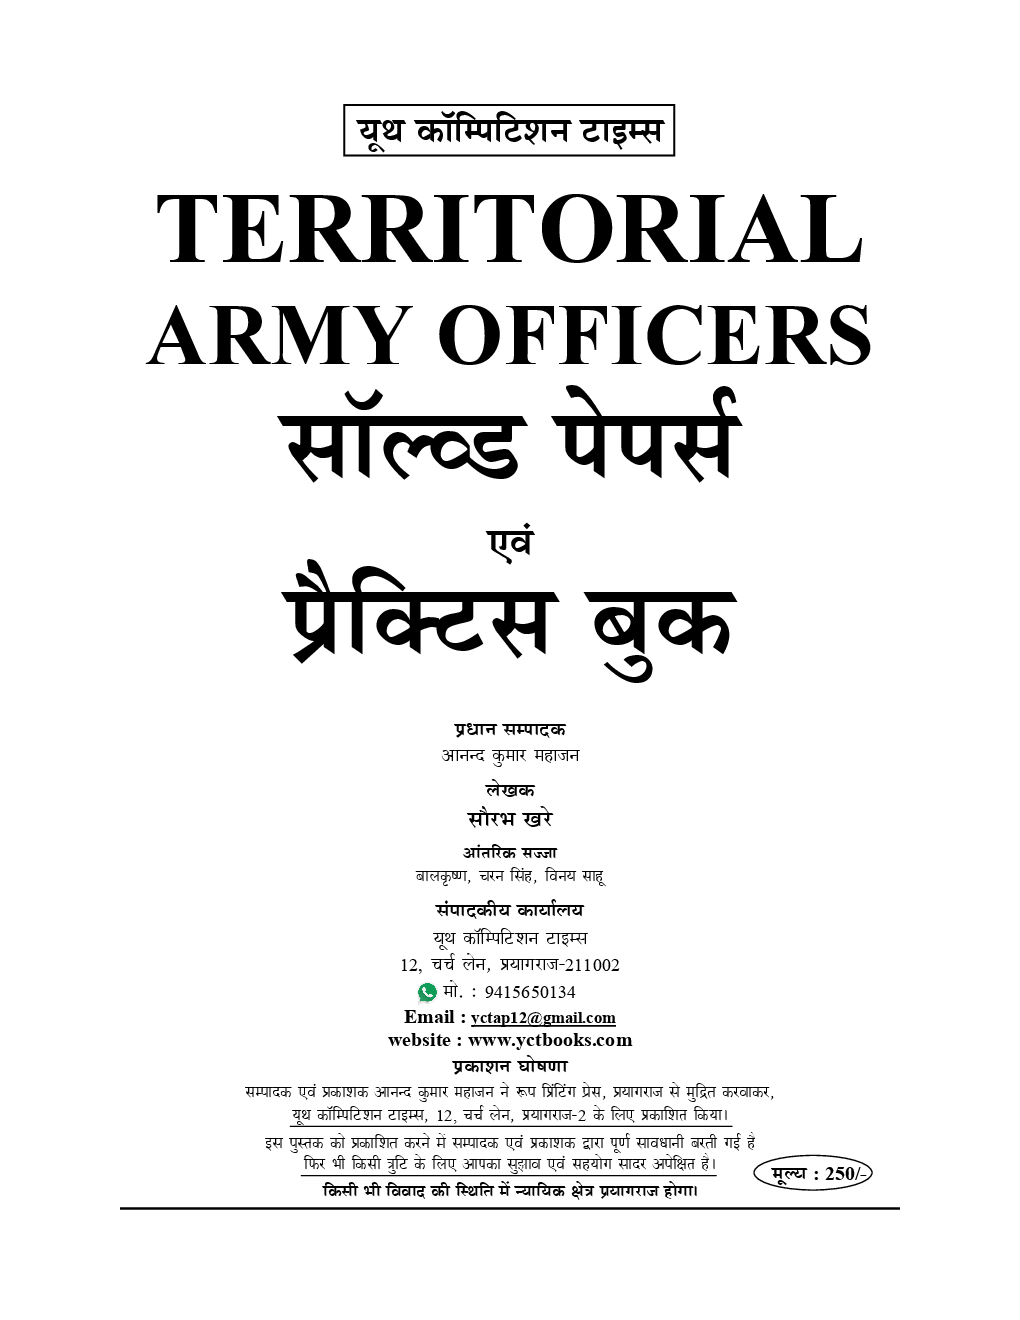 Territorial Army Officers साल्व्ड पेपर्स & प्रैक्टिस बुक Paper - I & II (2019) - Page 2